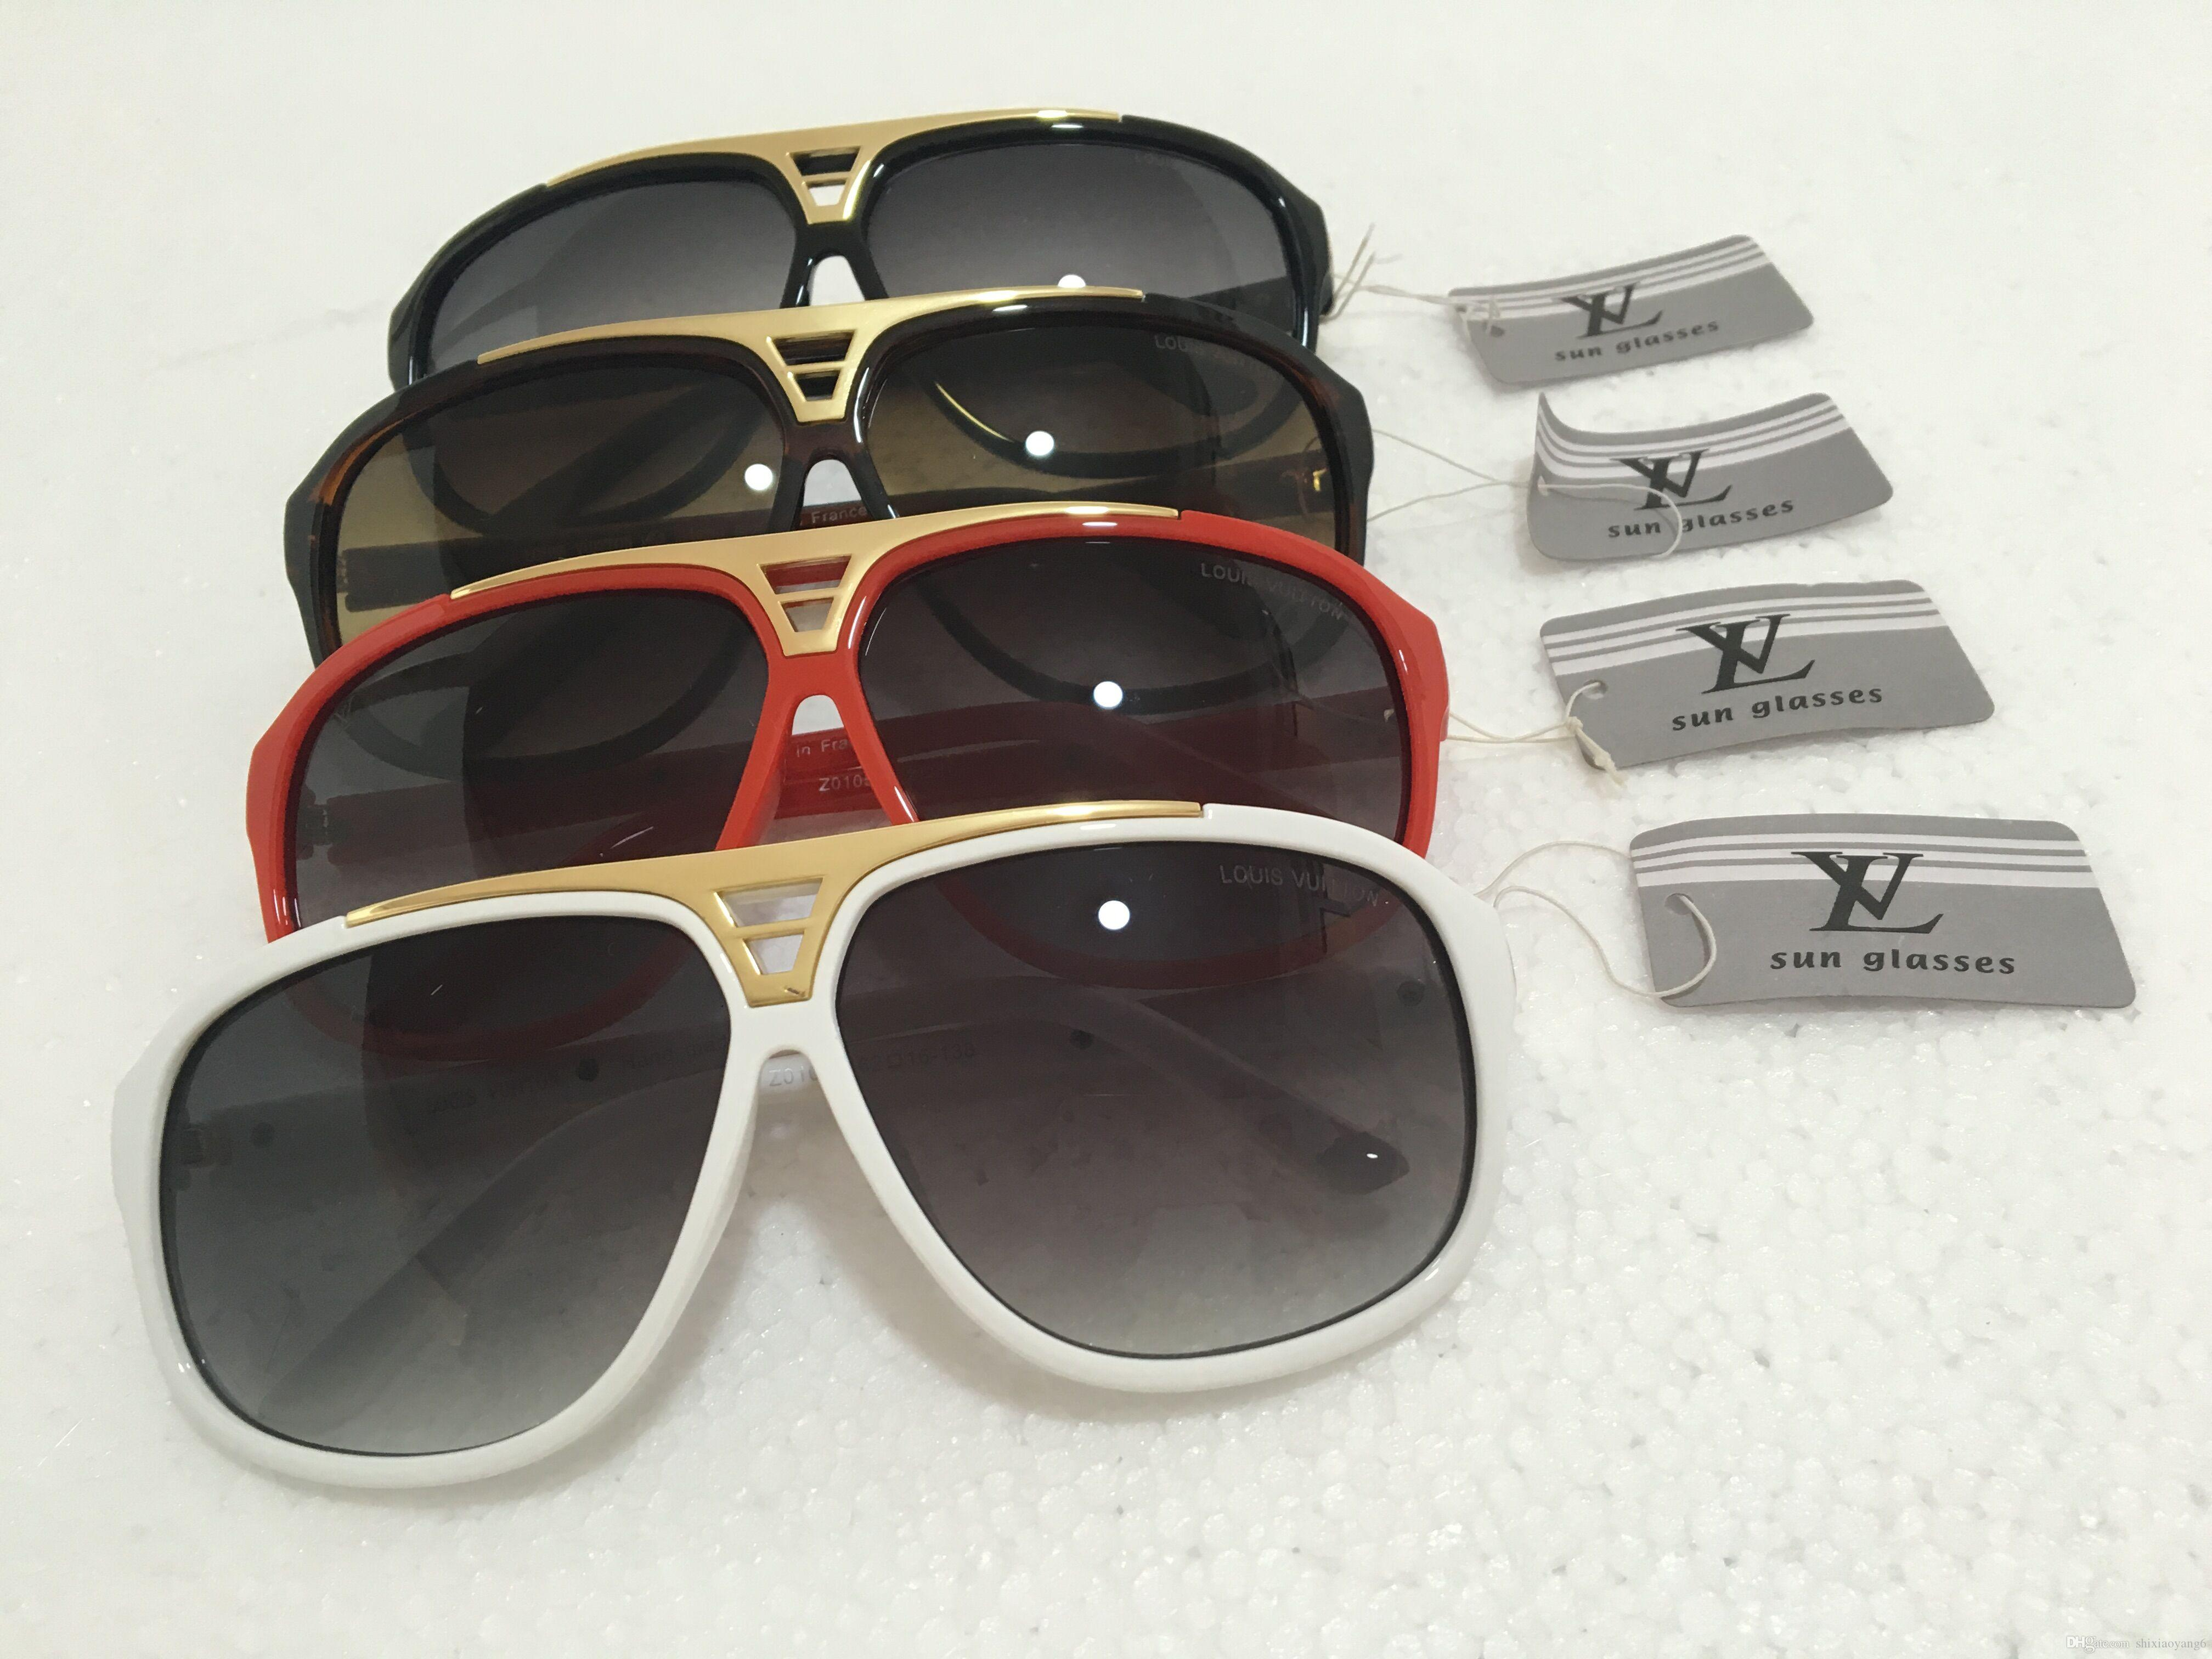 f4d462437 Top Quality Designer Classic Pilot Sunglasses Eyewear Mens Womes Full Color  Tortoise Leopard 58mm Gradient Brown Flash Glass Lens Case Dragon Sunglasses  ...